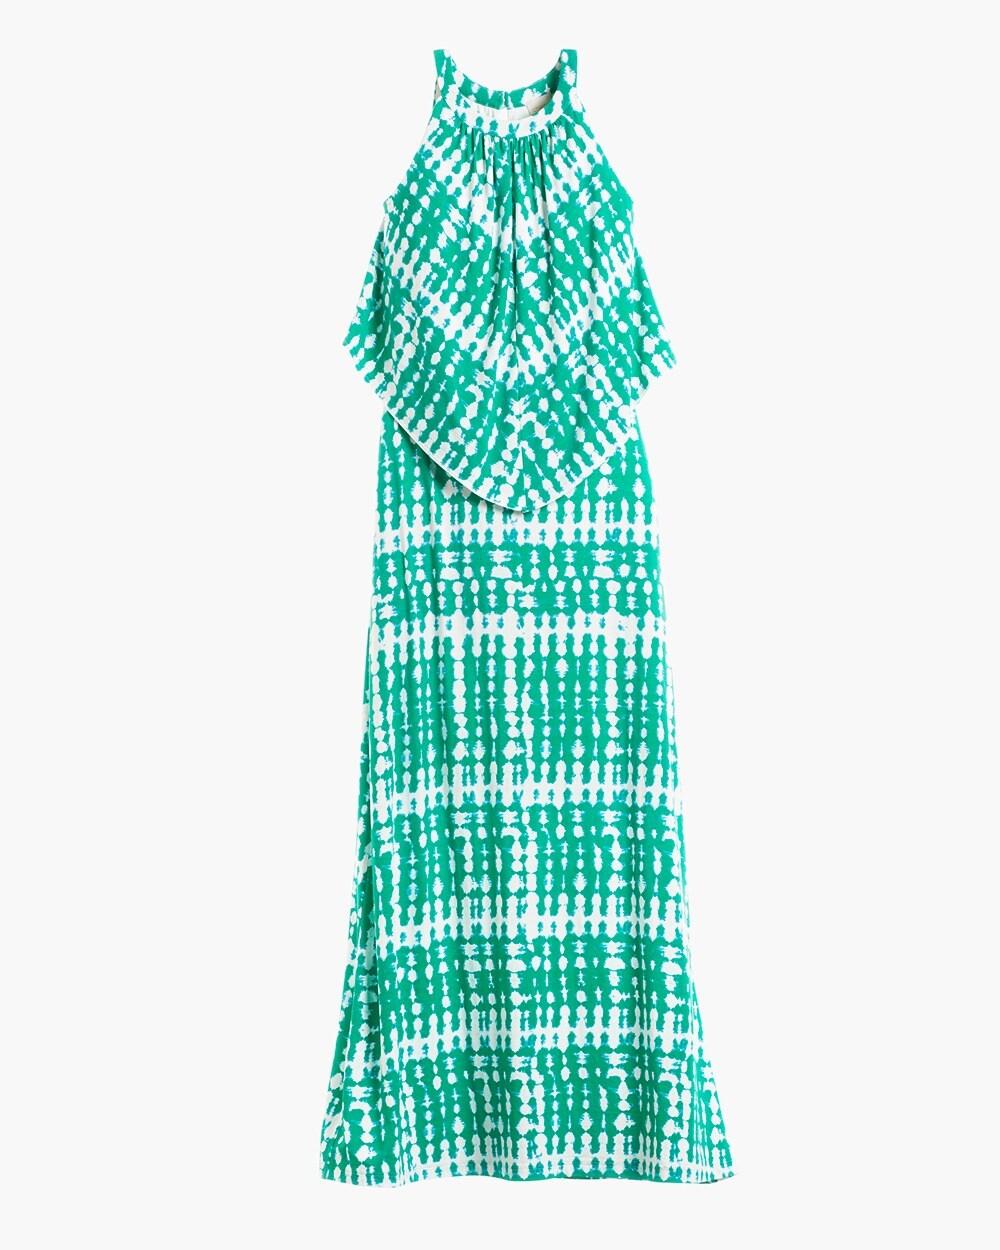 e2122c0dfae Return to thumbnail image selection Breezy Tie-Dye Popover Maxi Dress